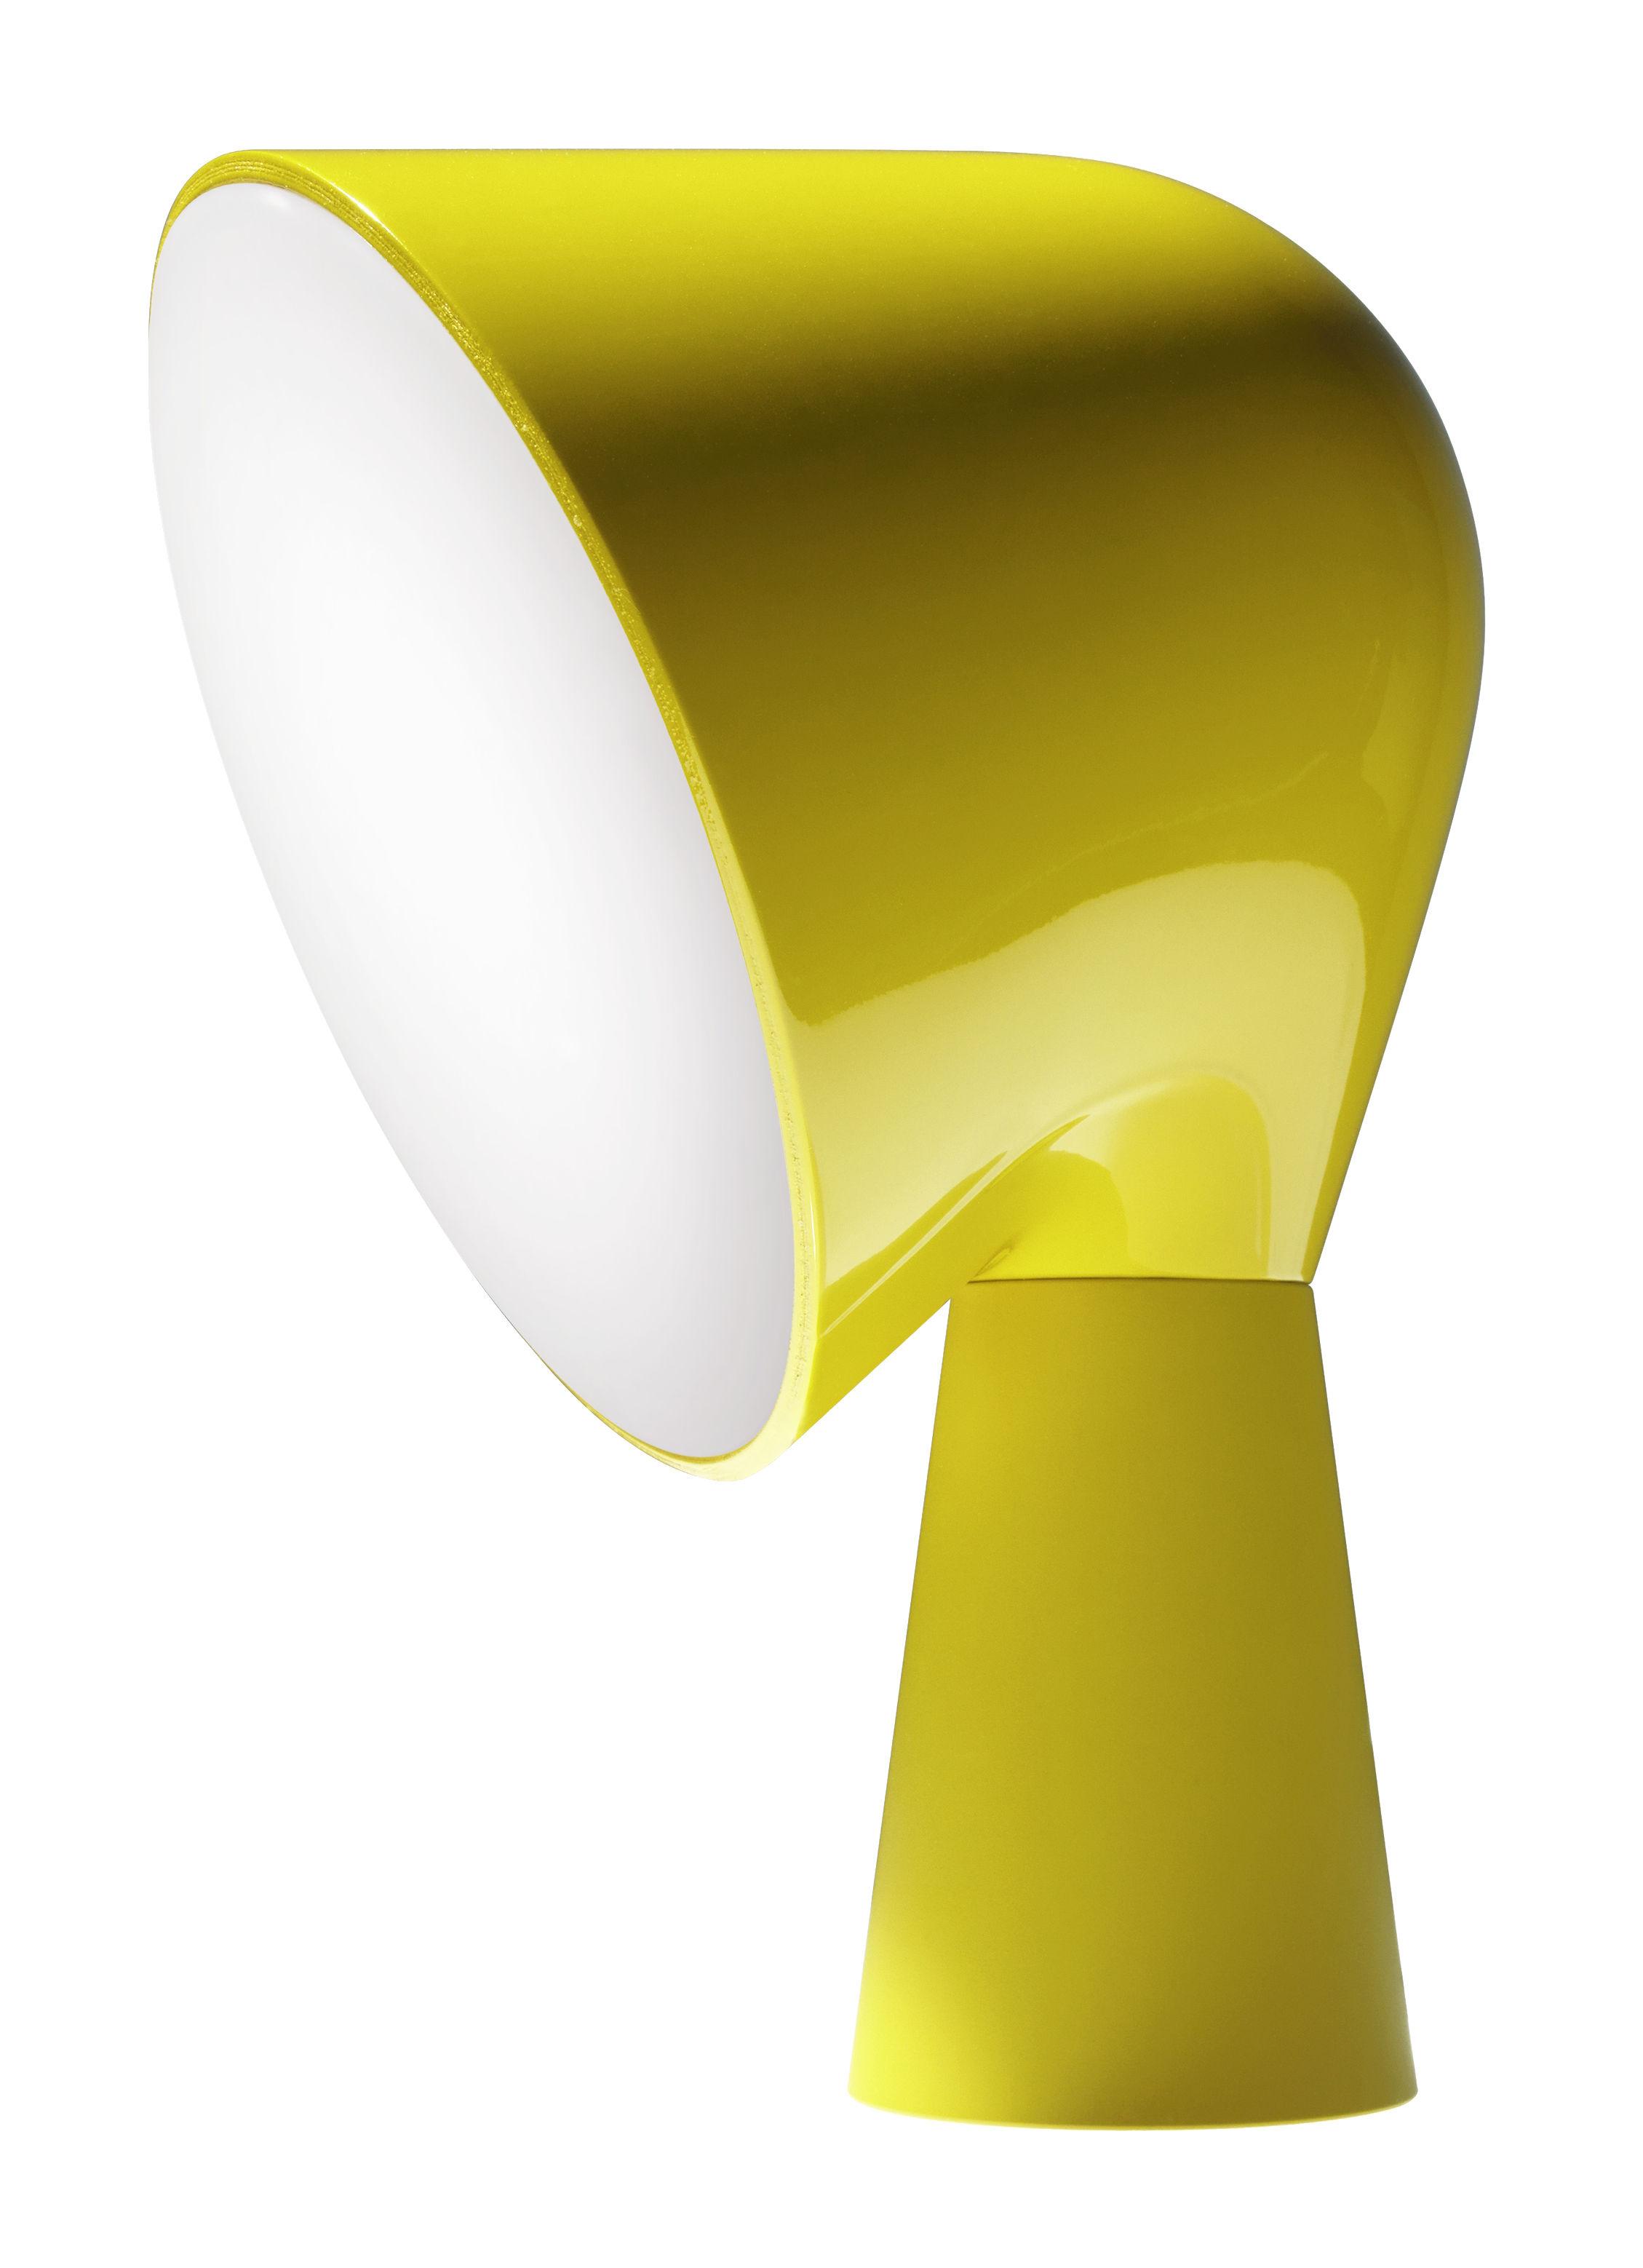 Zoom - Lamp binic ...